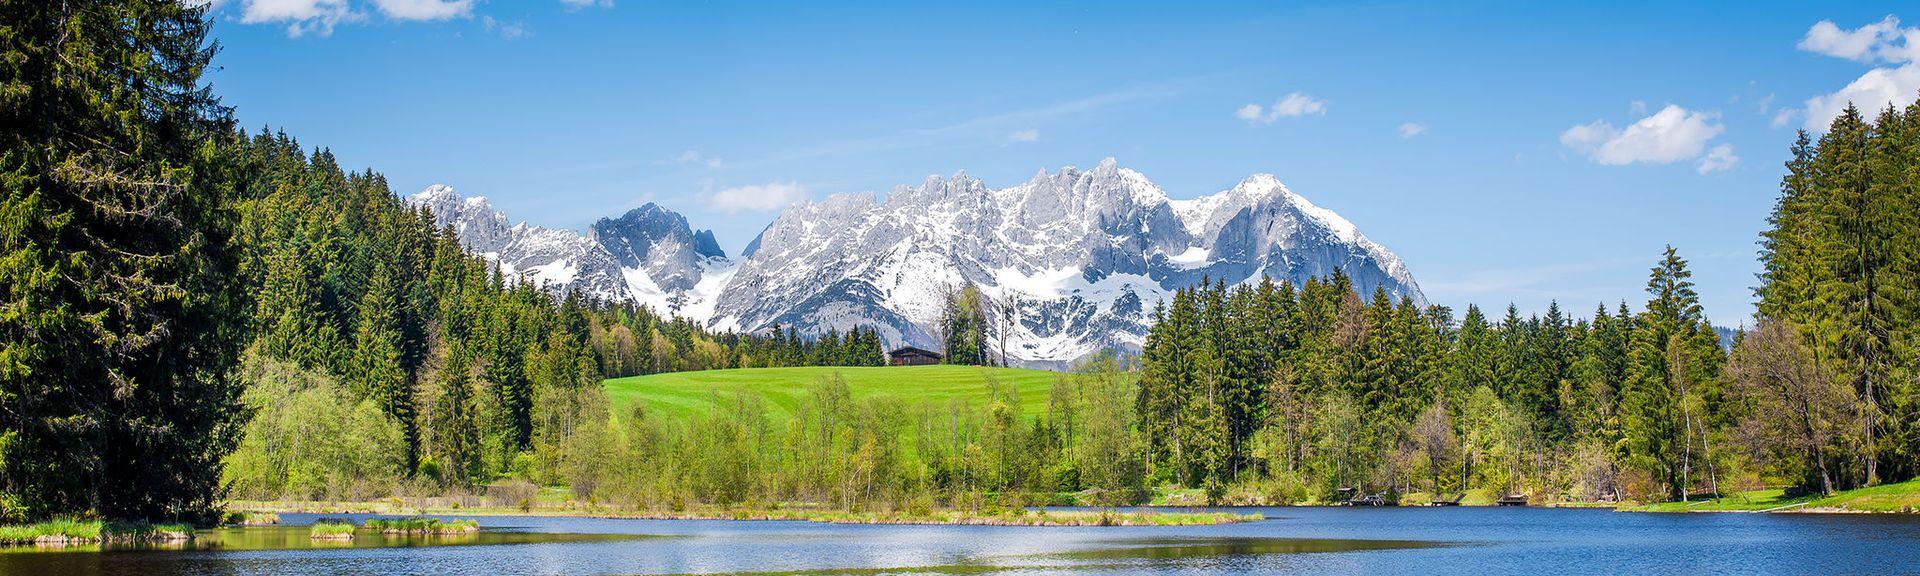 Saalbach-Hinterglemm Ski Resort, Saalbach, Austria